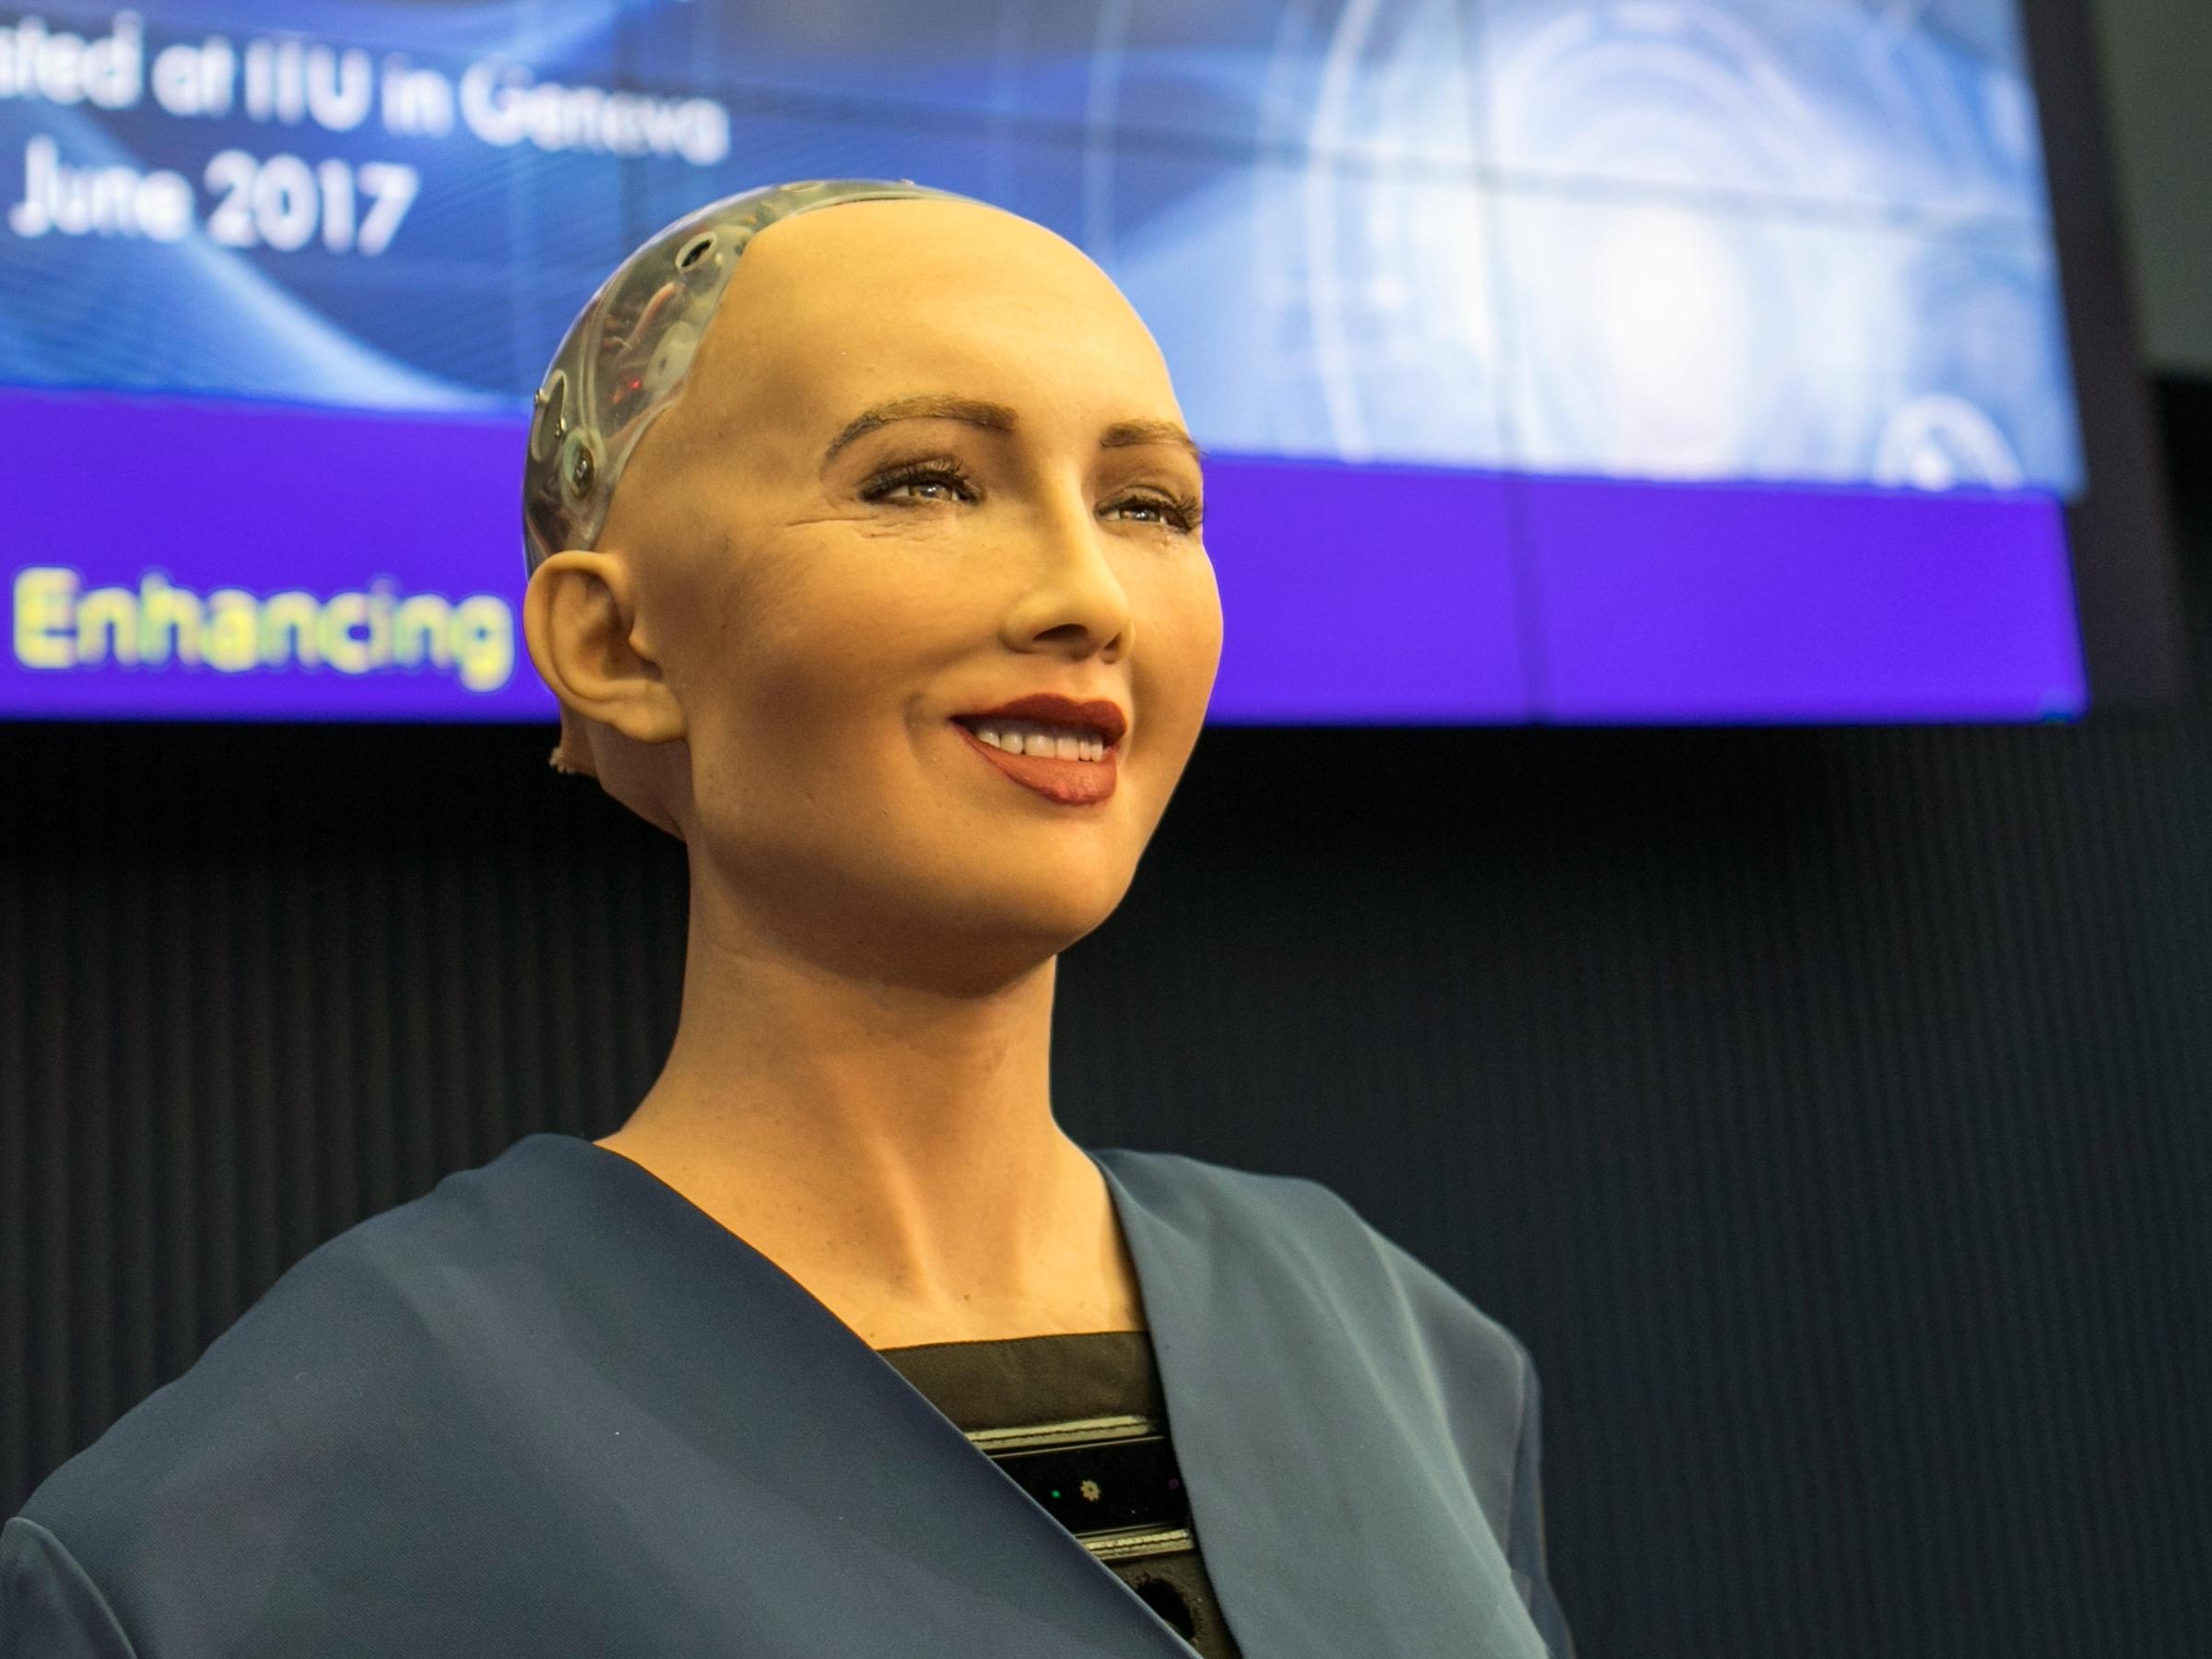 career in robotics, robotic engineering, robotic futire, robotics in india, colleges for robotics, wehre to study robotics, jobs in robotics, what do robotics engineers do